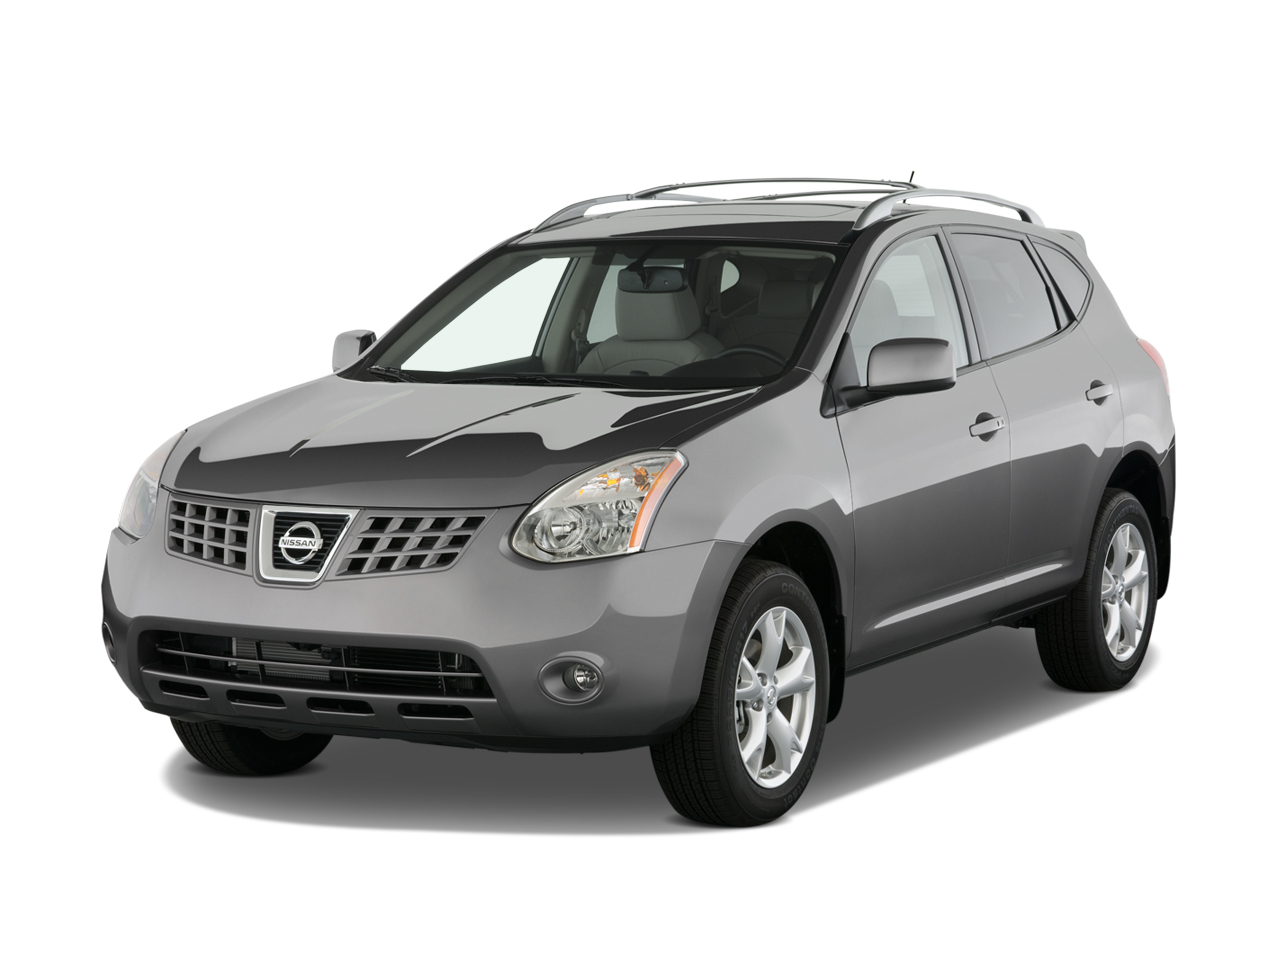 Ford Dealership Albuquerque >> 2010 Nissan Rogue: Navigation Built in